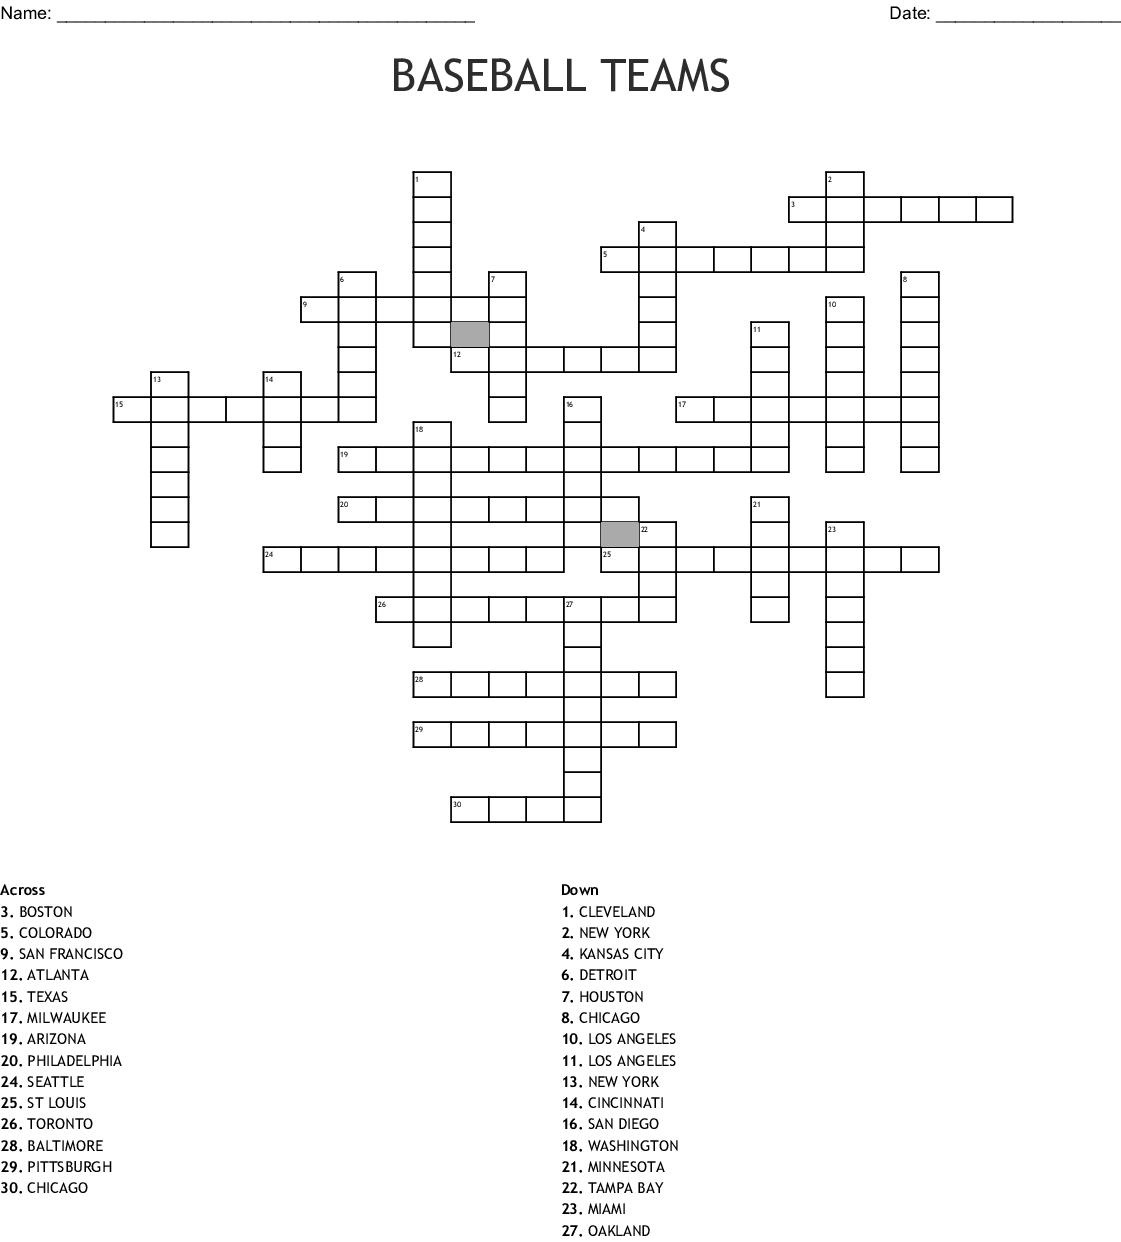 Baseball Teams Crossword - Wordmint - Printable Baseball Crossword Puzzles